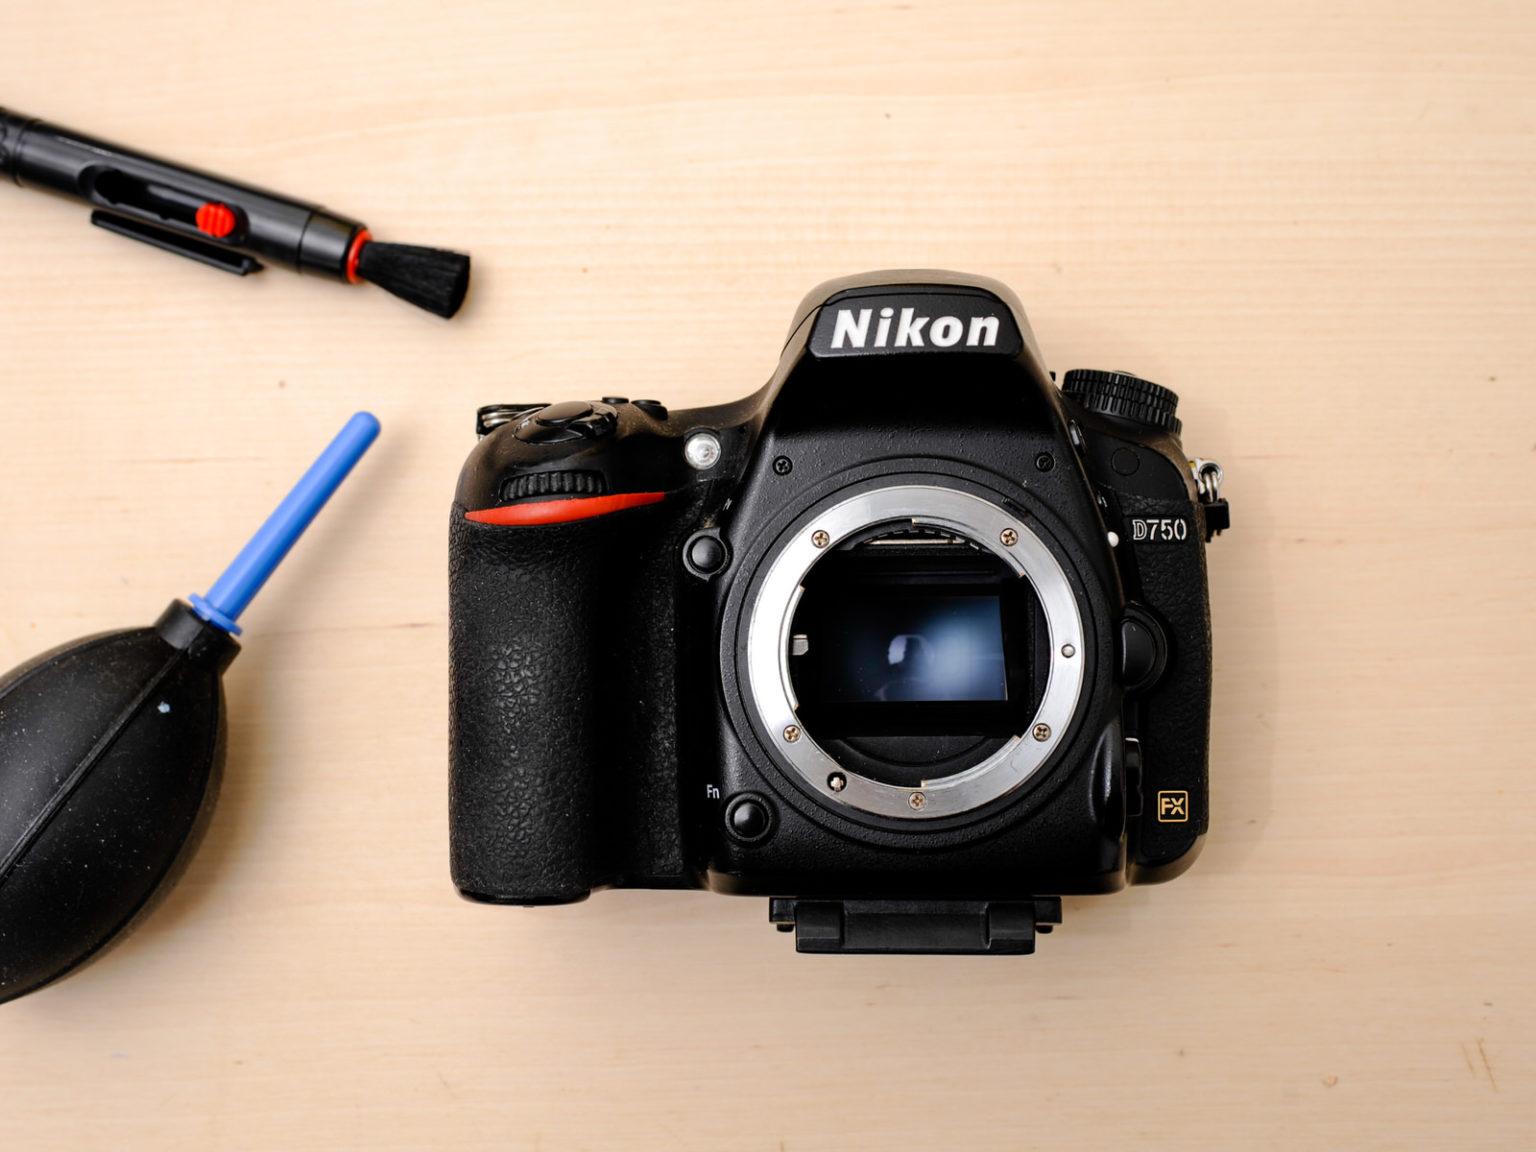 Nettoyage de capteur appareil Nikon d750 plein format full frame fx Atelier Christophe Lefebvre Maisons-Laffitte Yvelines 78